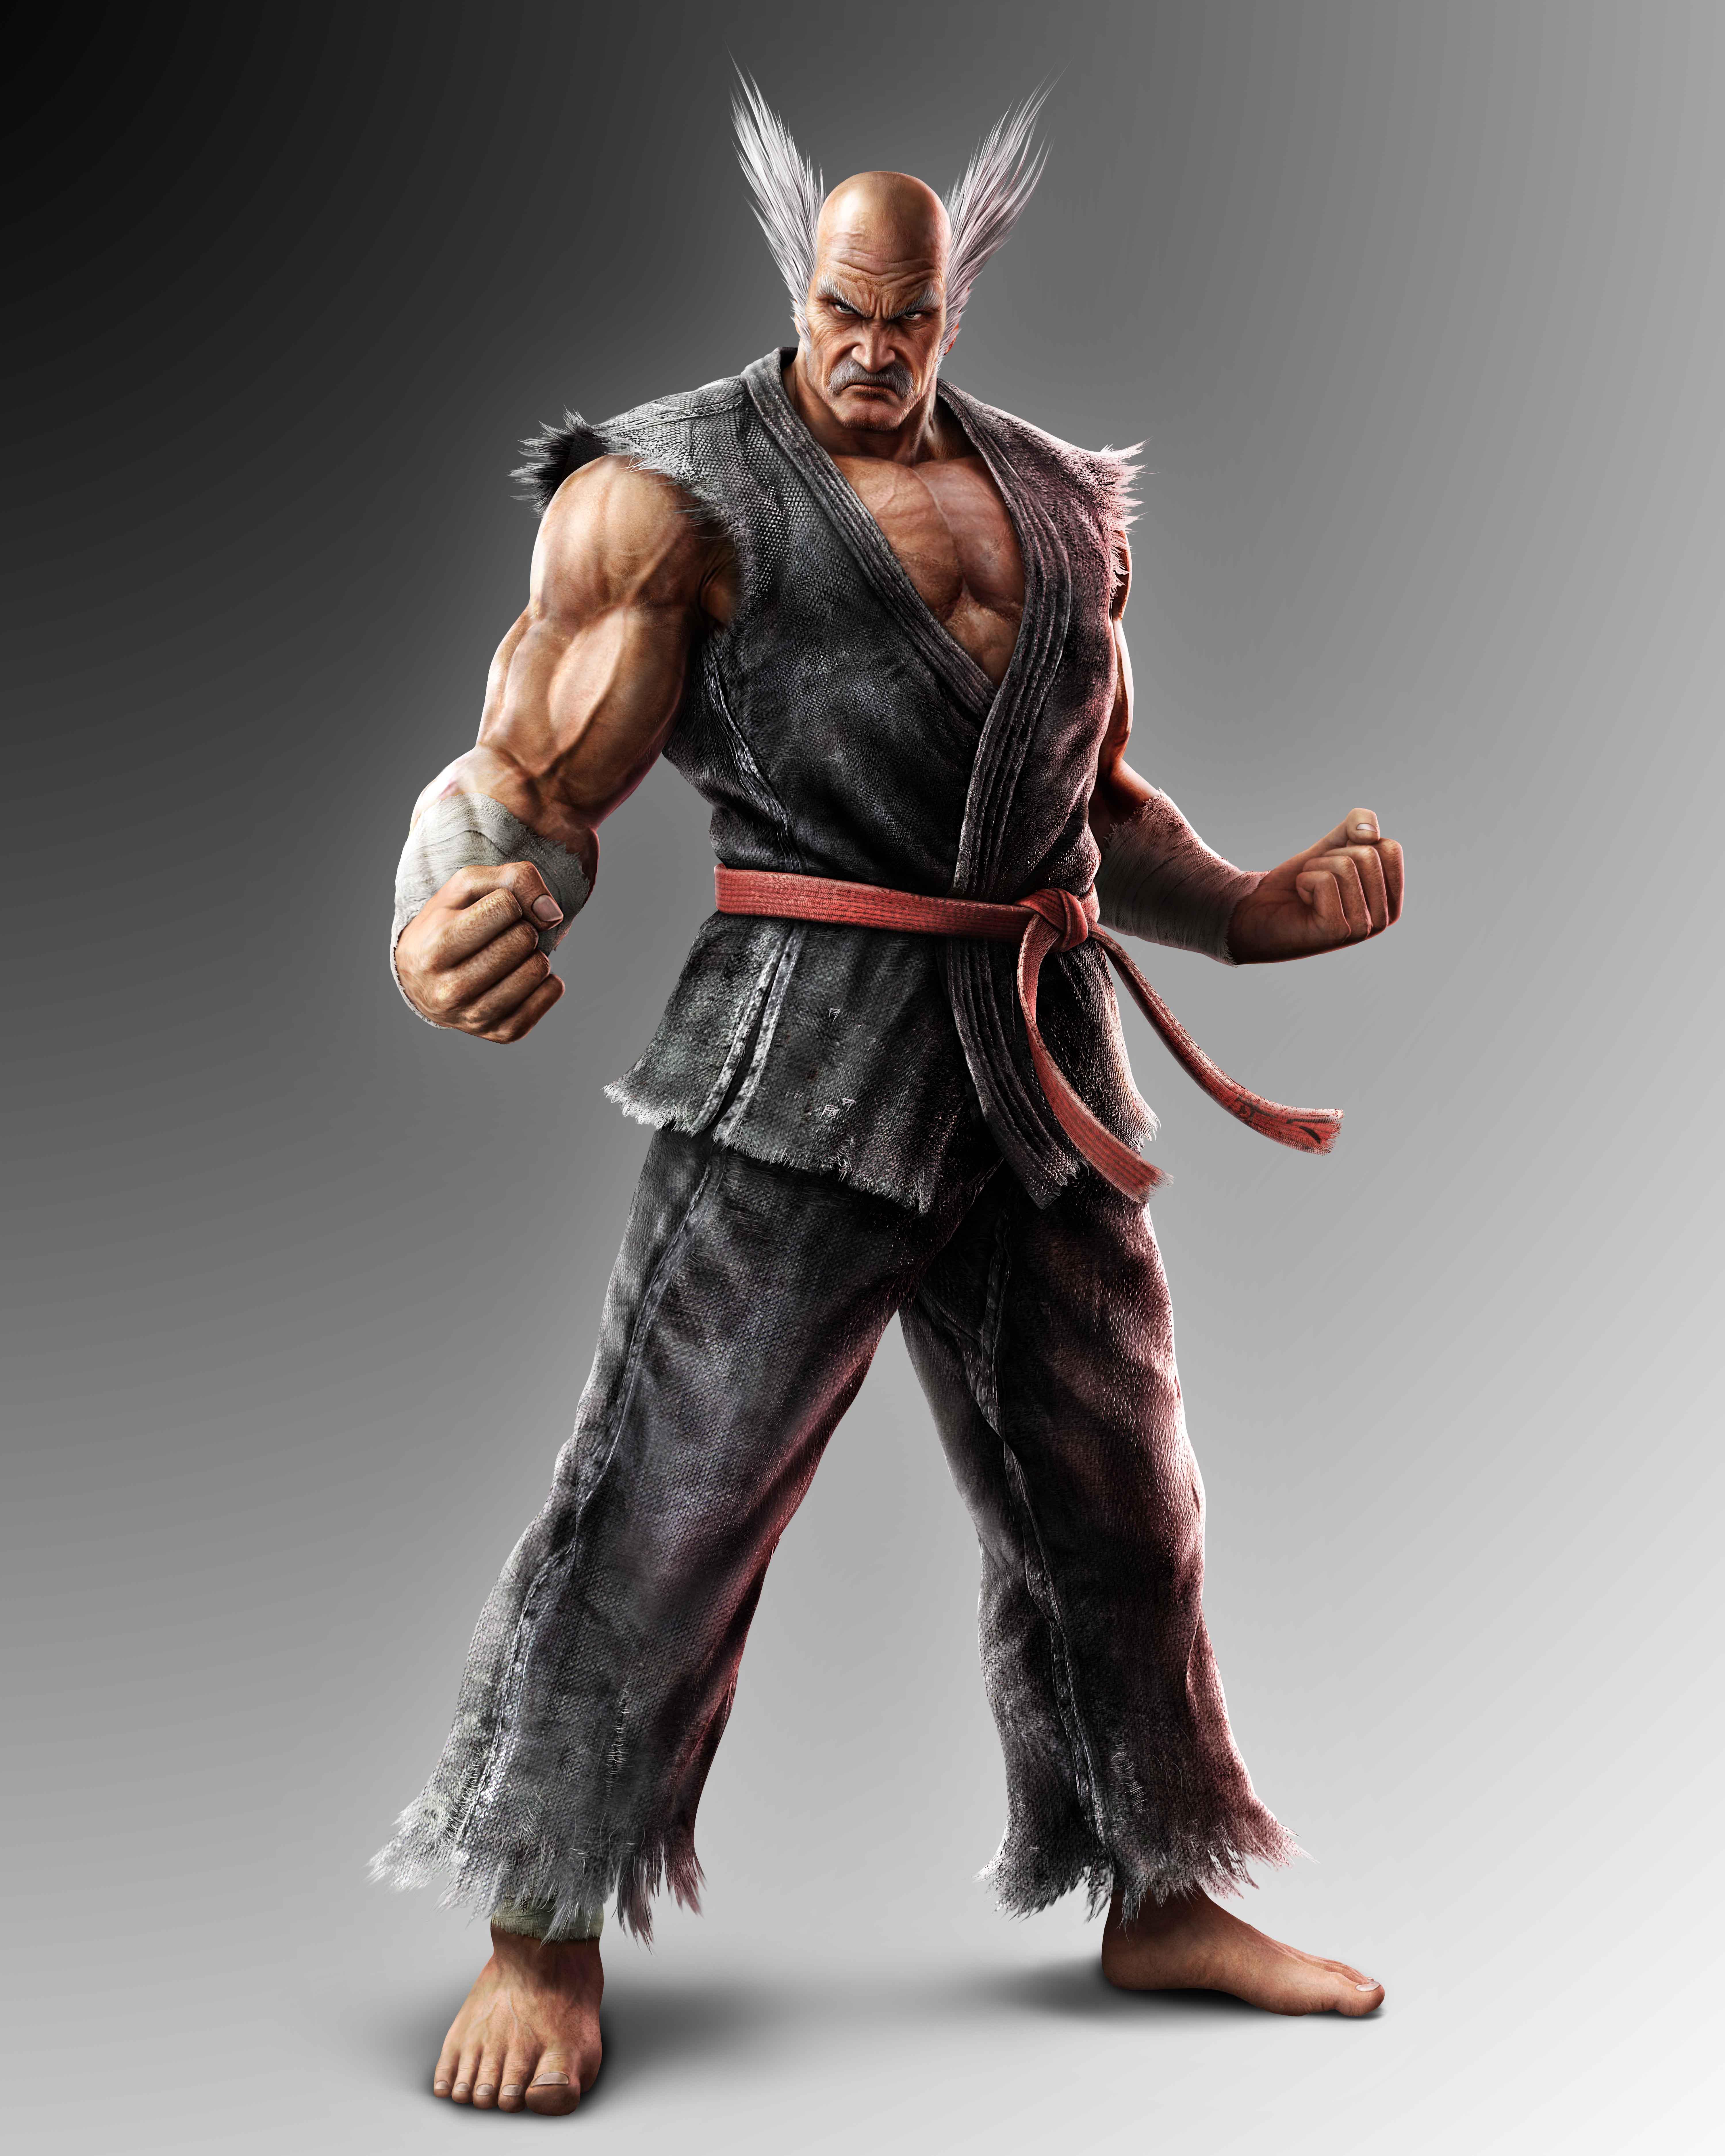 Tekken 3 Kazuya